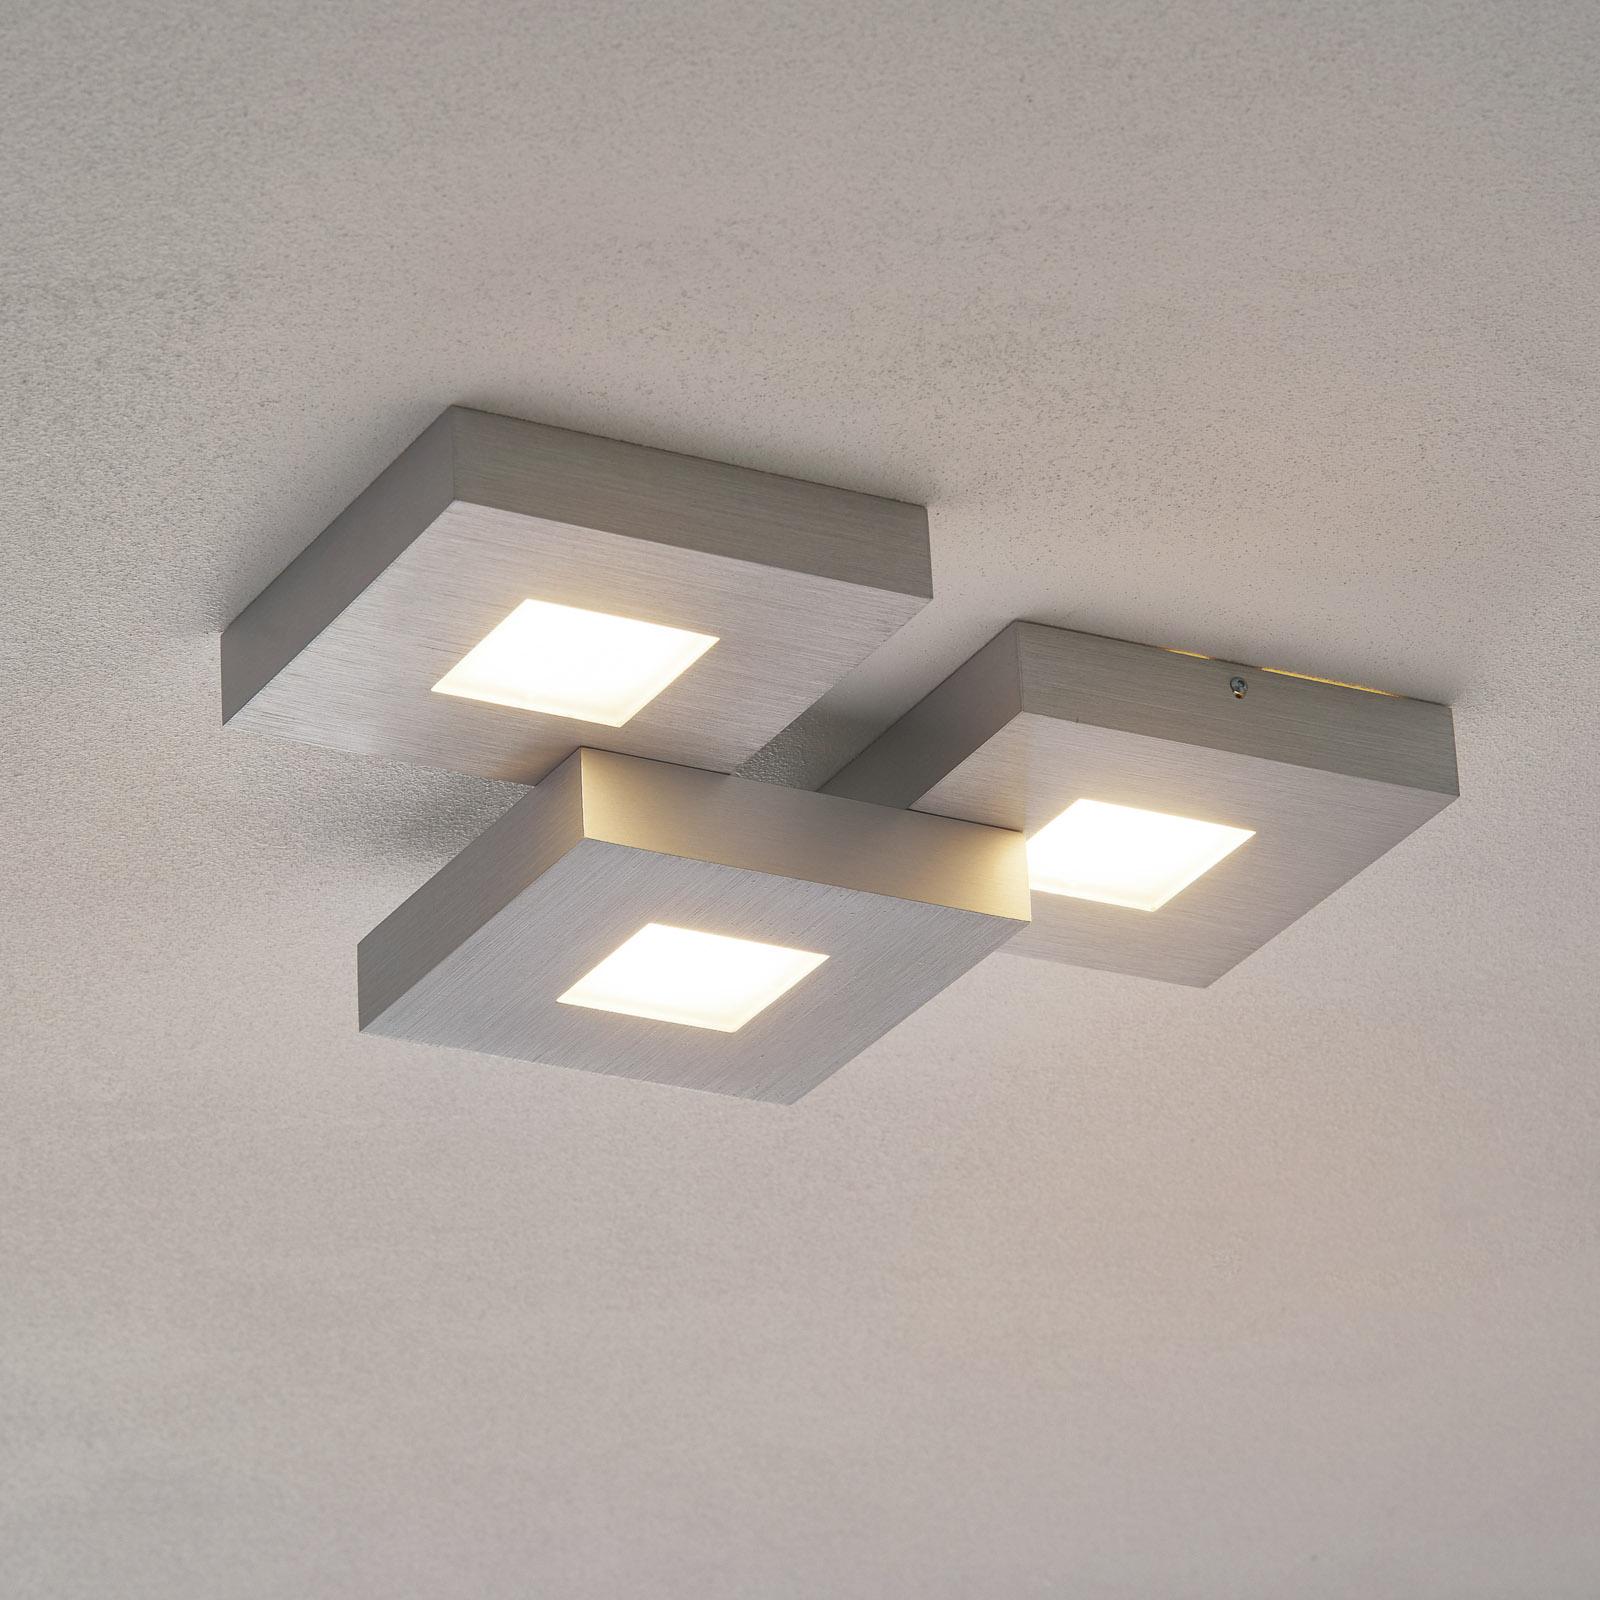 Bopp Cubus - 3-flammige LED-Deckenleuchte